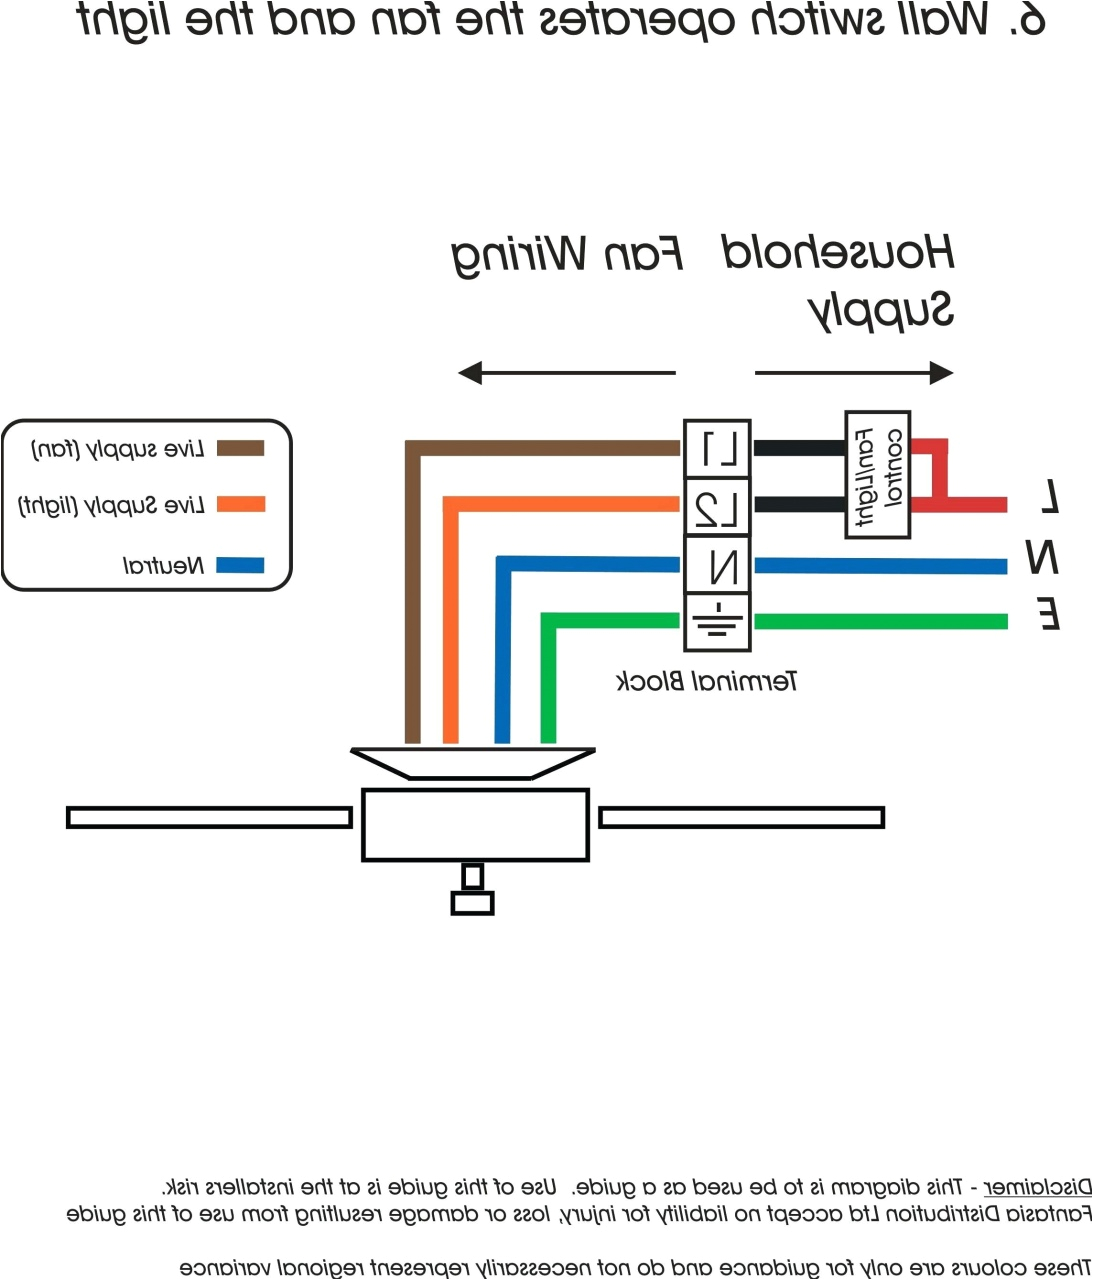 Broan Bathroom Fan Wiring Diagram Wiring Diagram for Bathroom Heater Fan Light Wiring